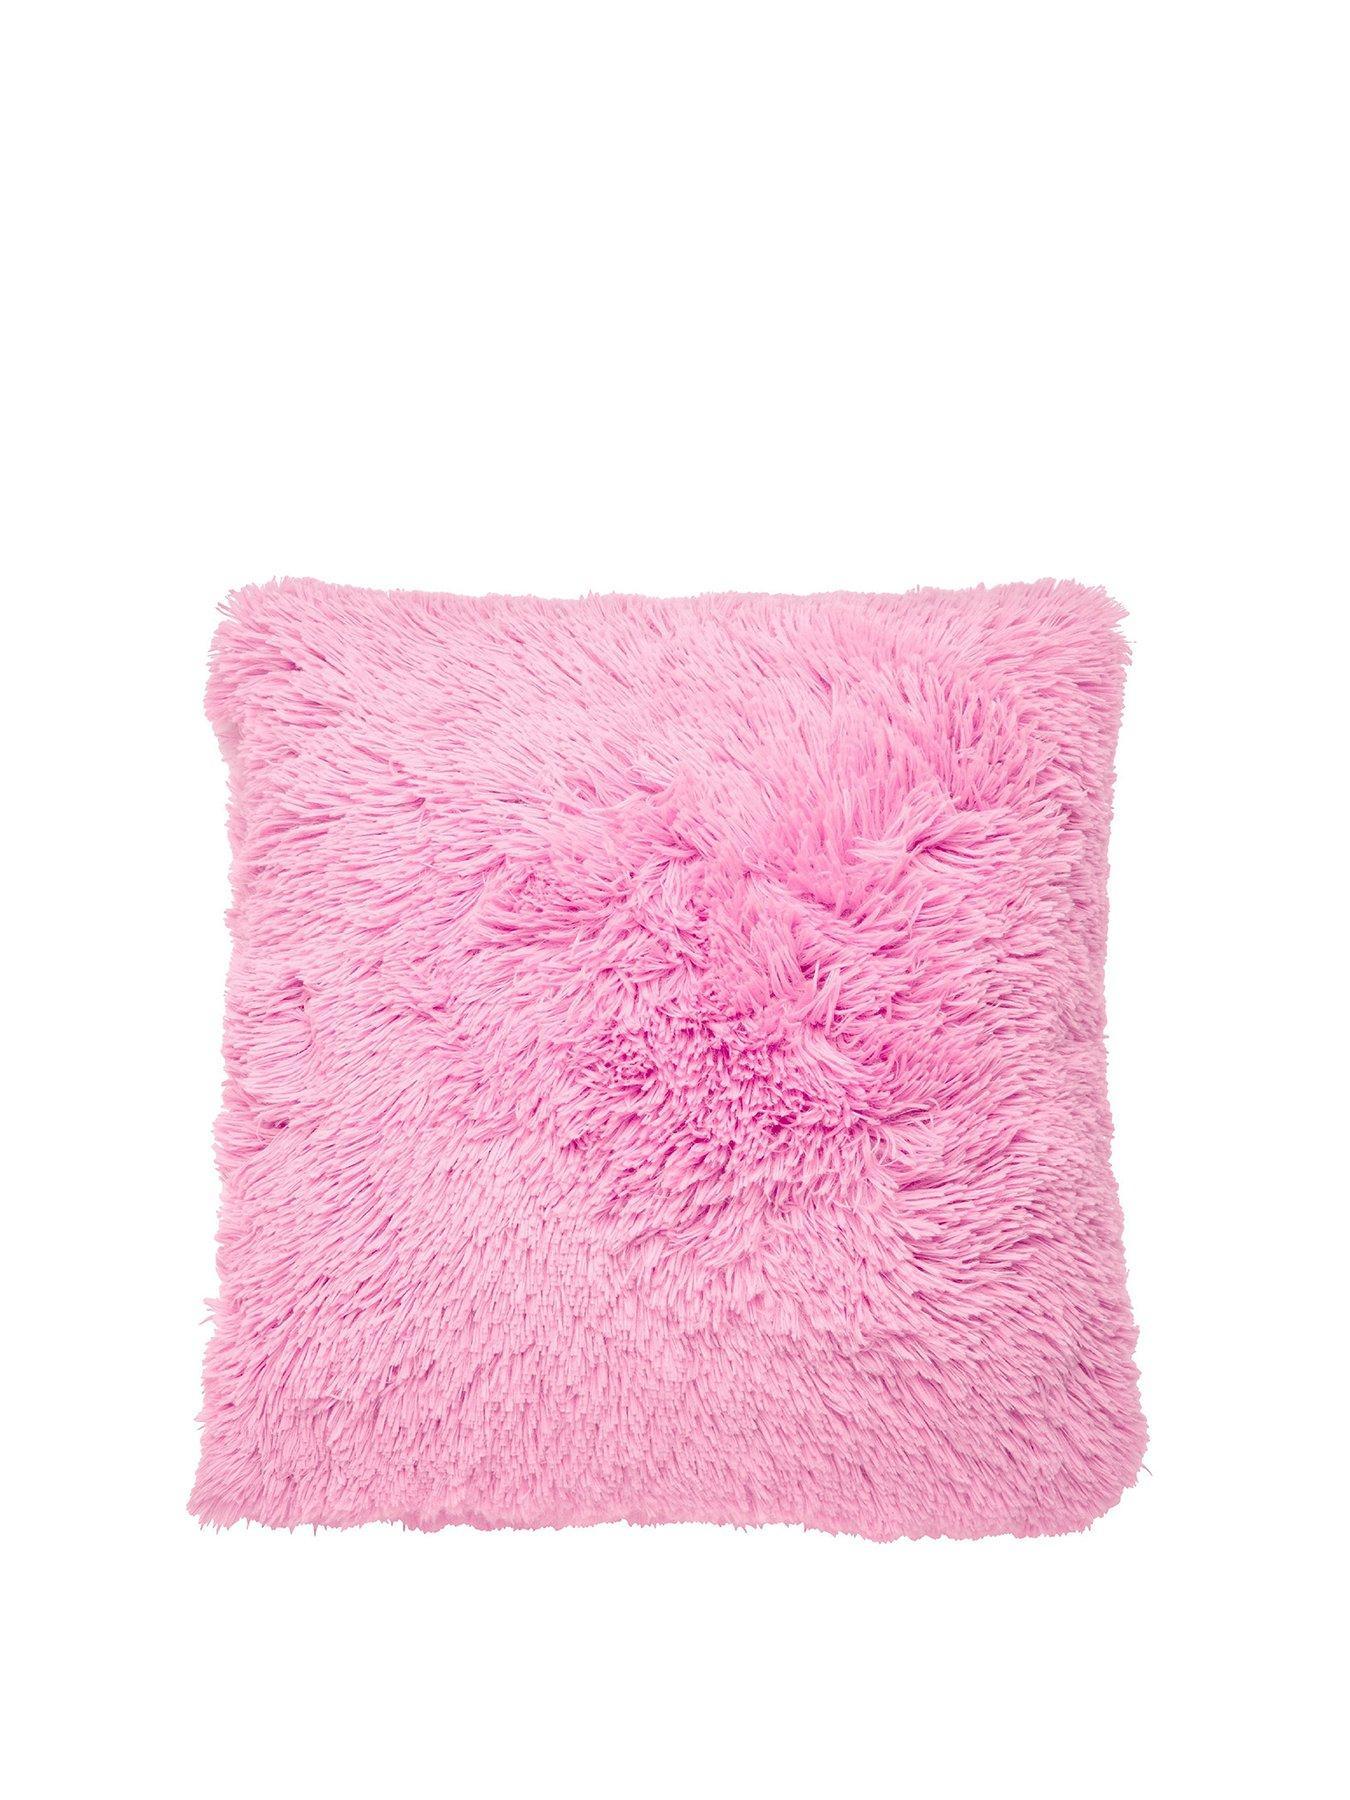 *Cathrine Lansfield* Floral Alicia Papri Pillow Shams x2